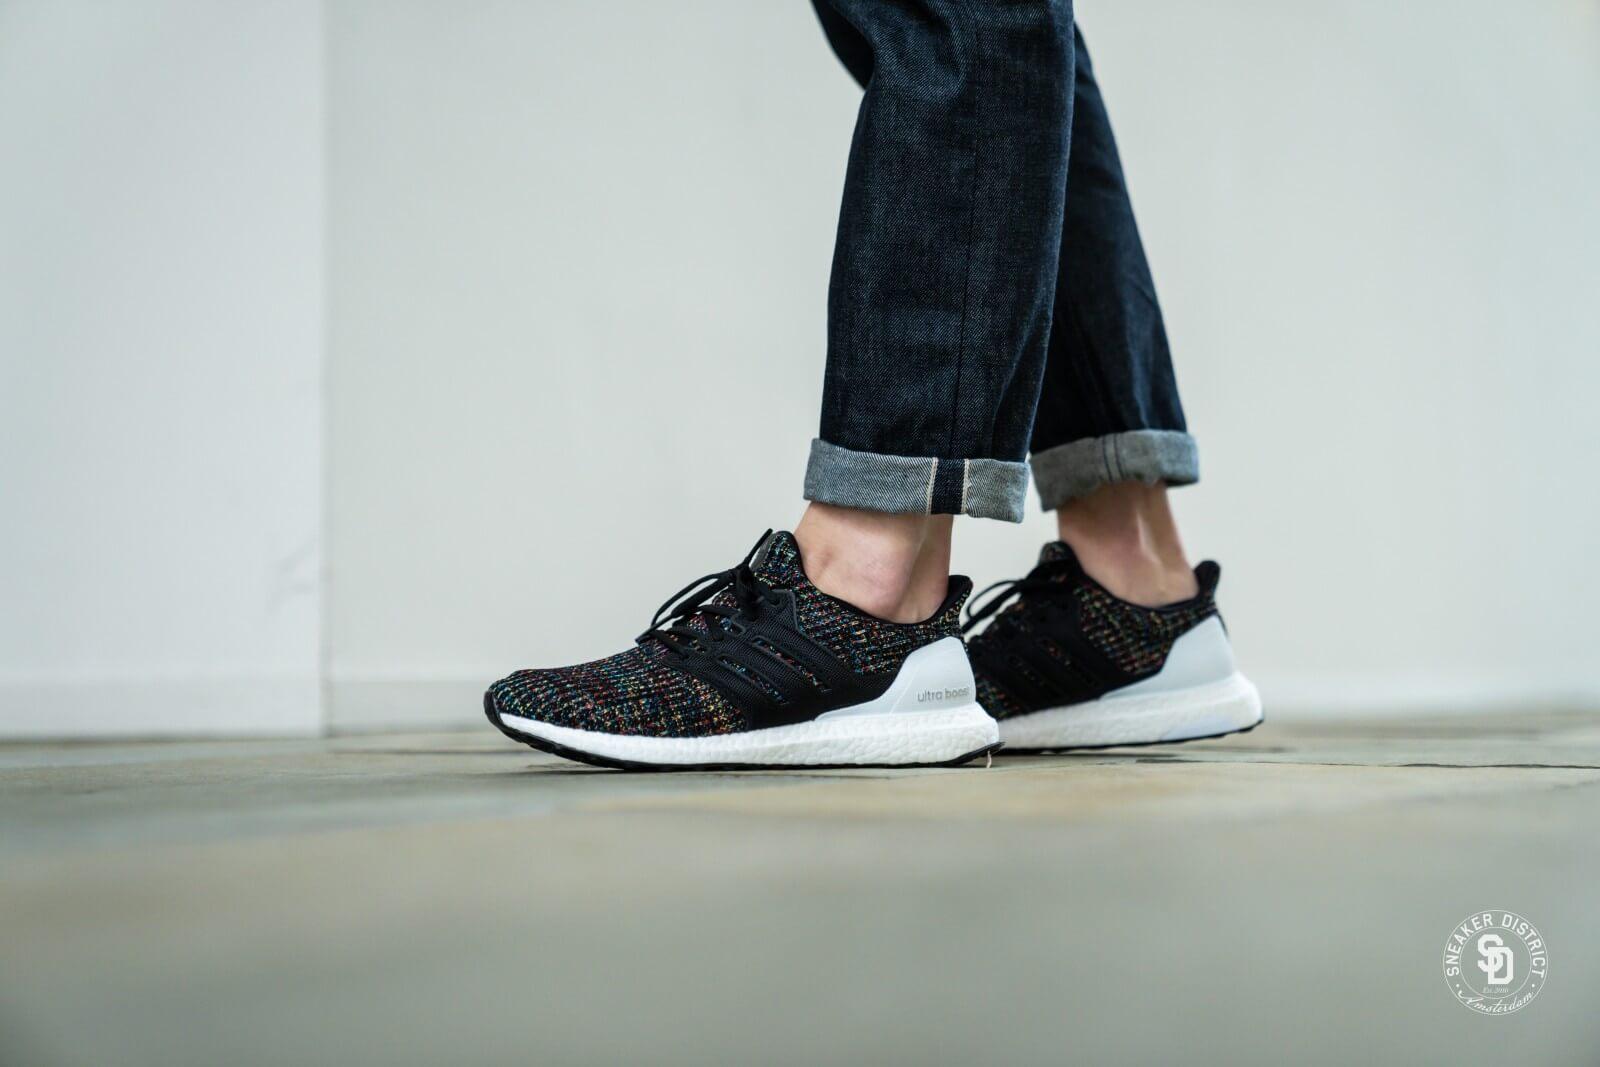 Adidas Ultra Boost 4.0 Black/Multicolor